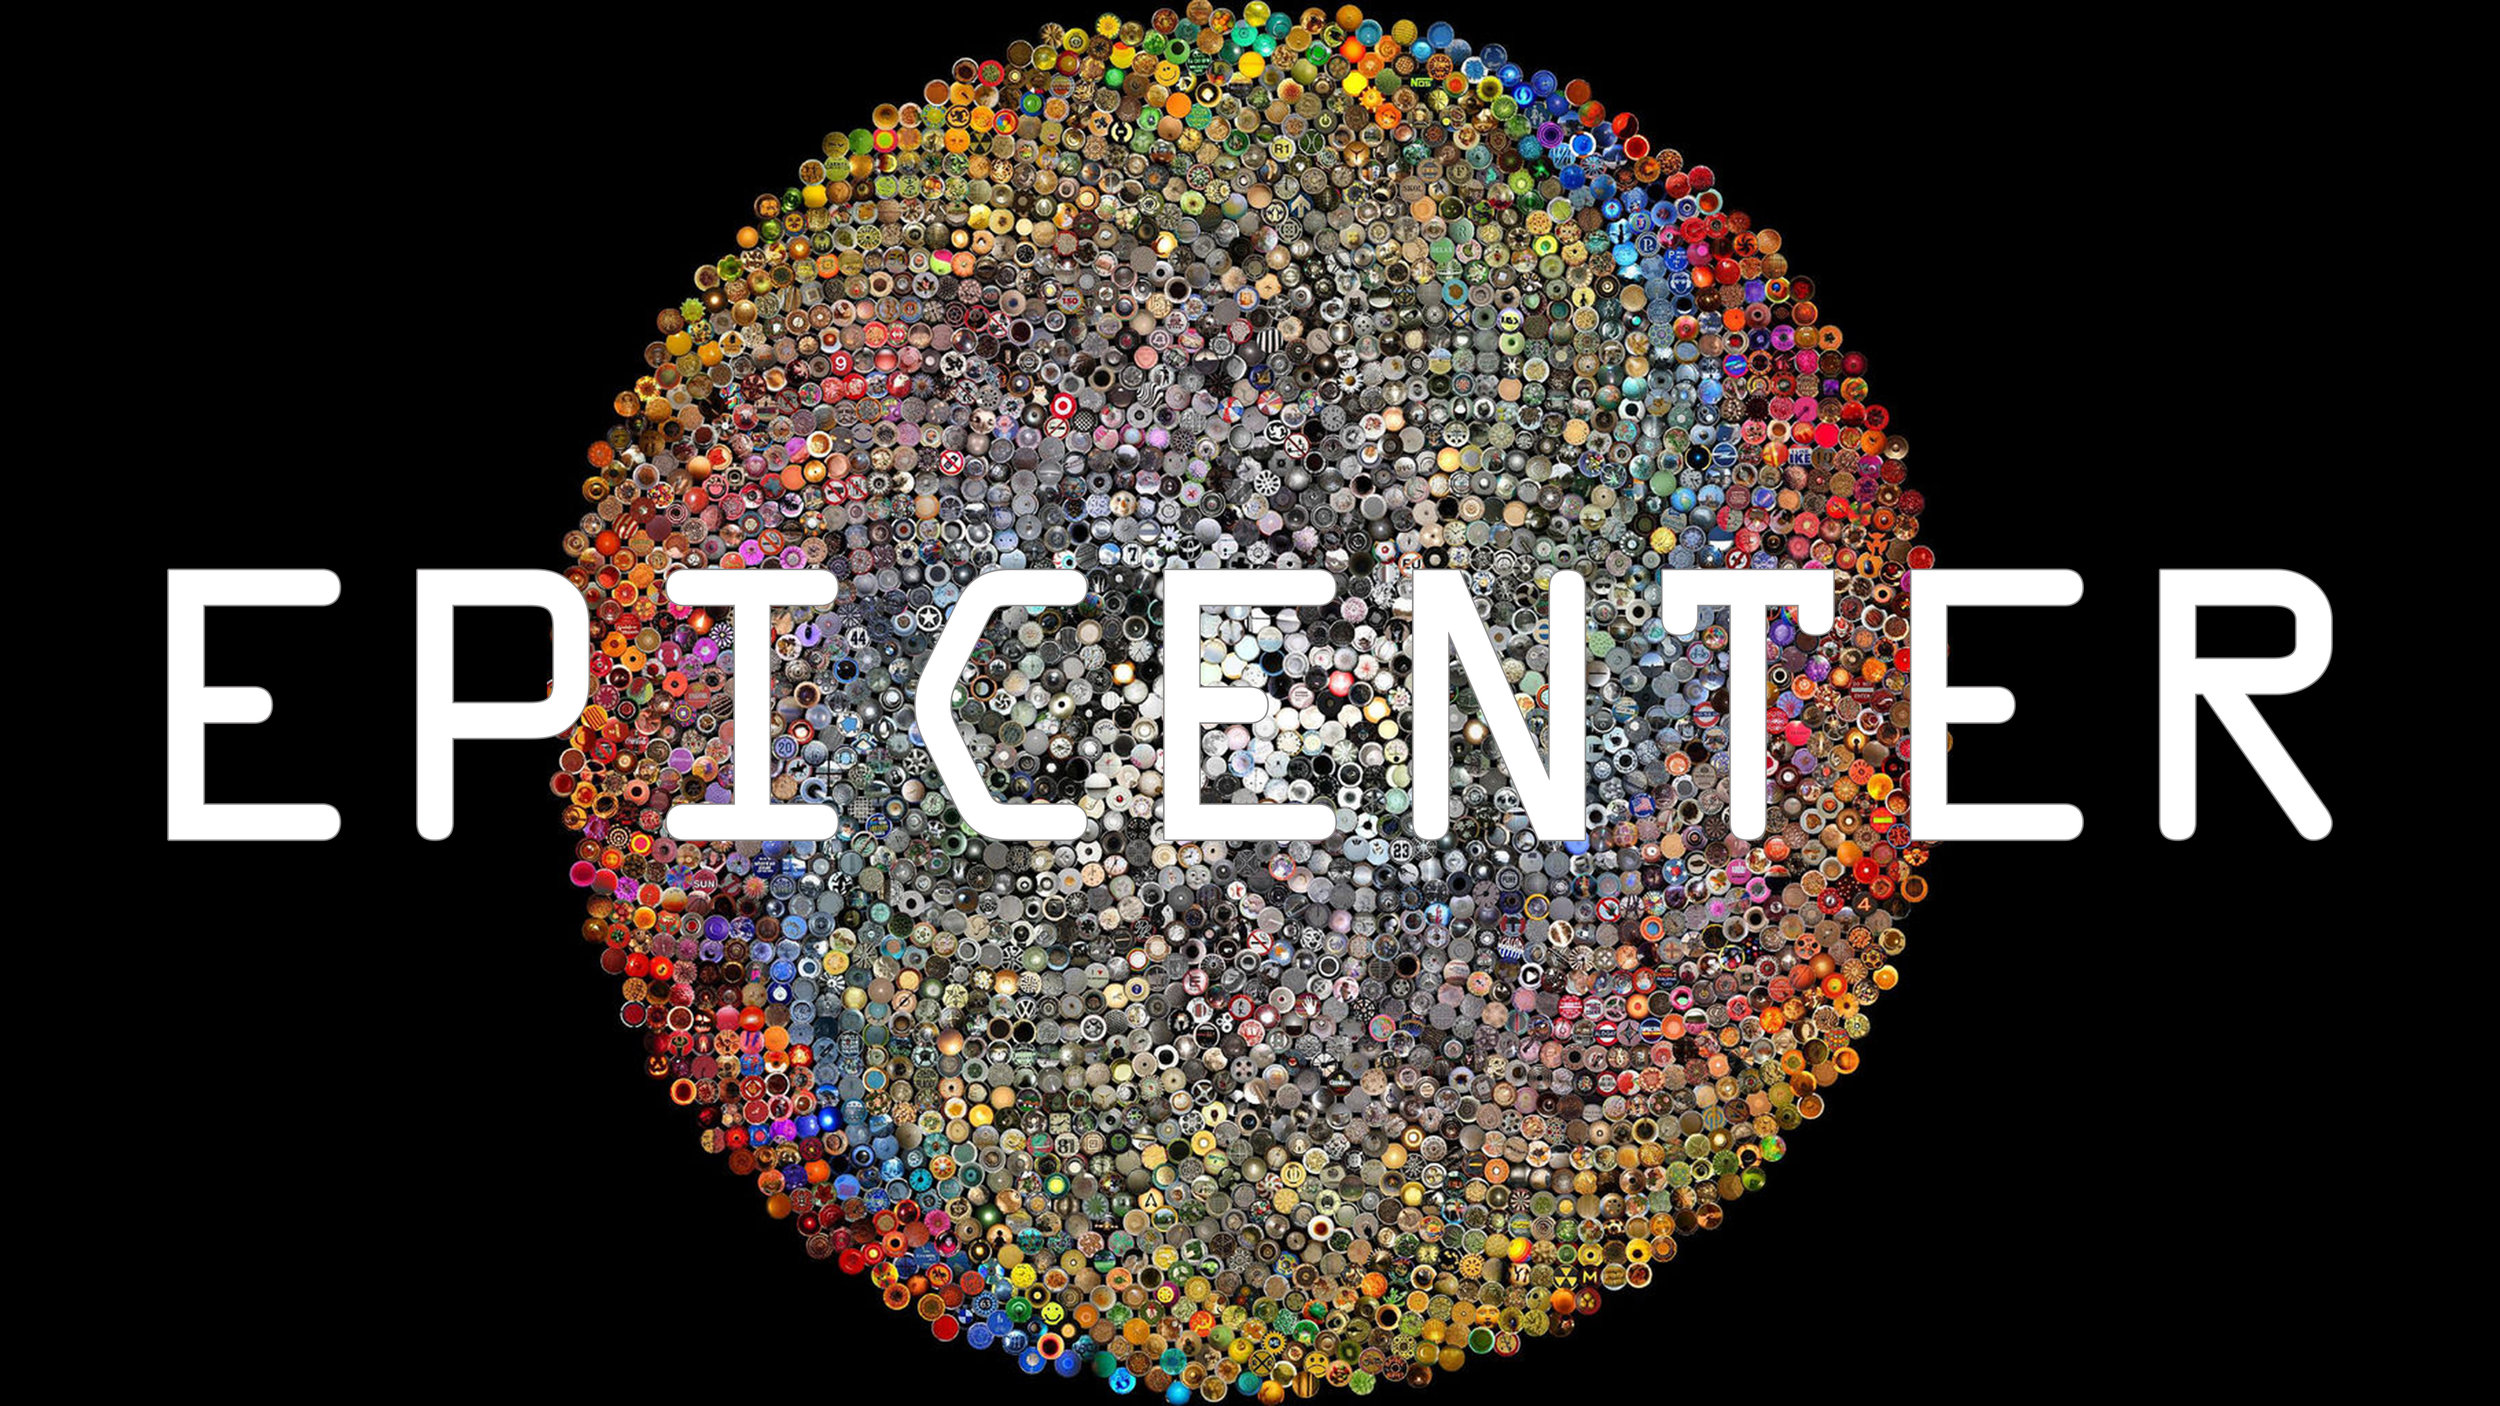 Epicenter - circlesthin.jpg